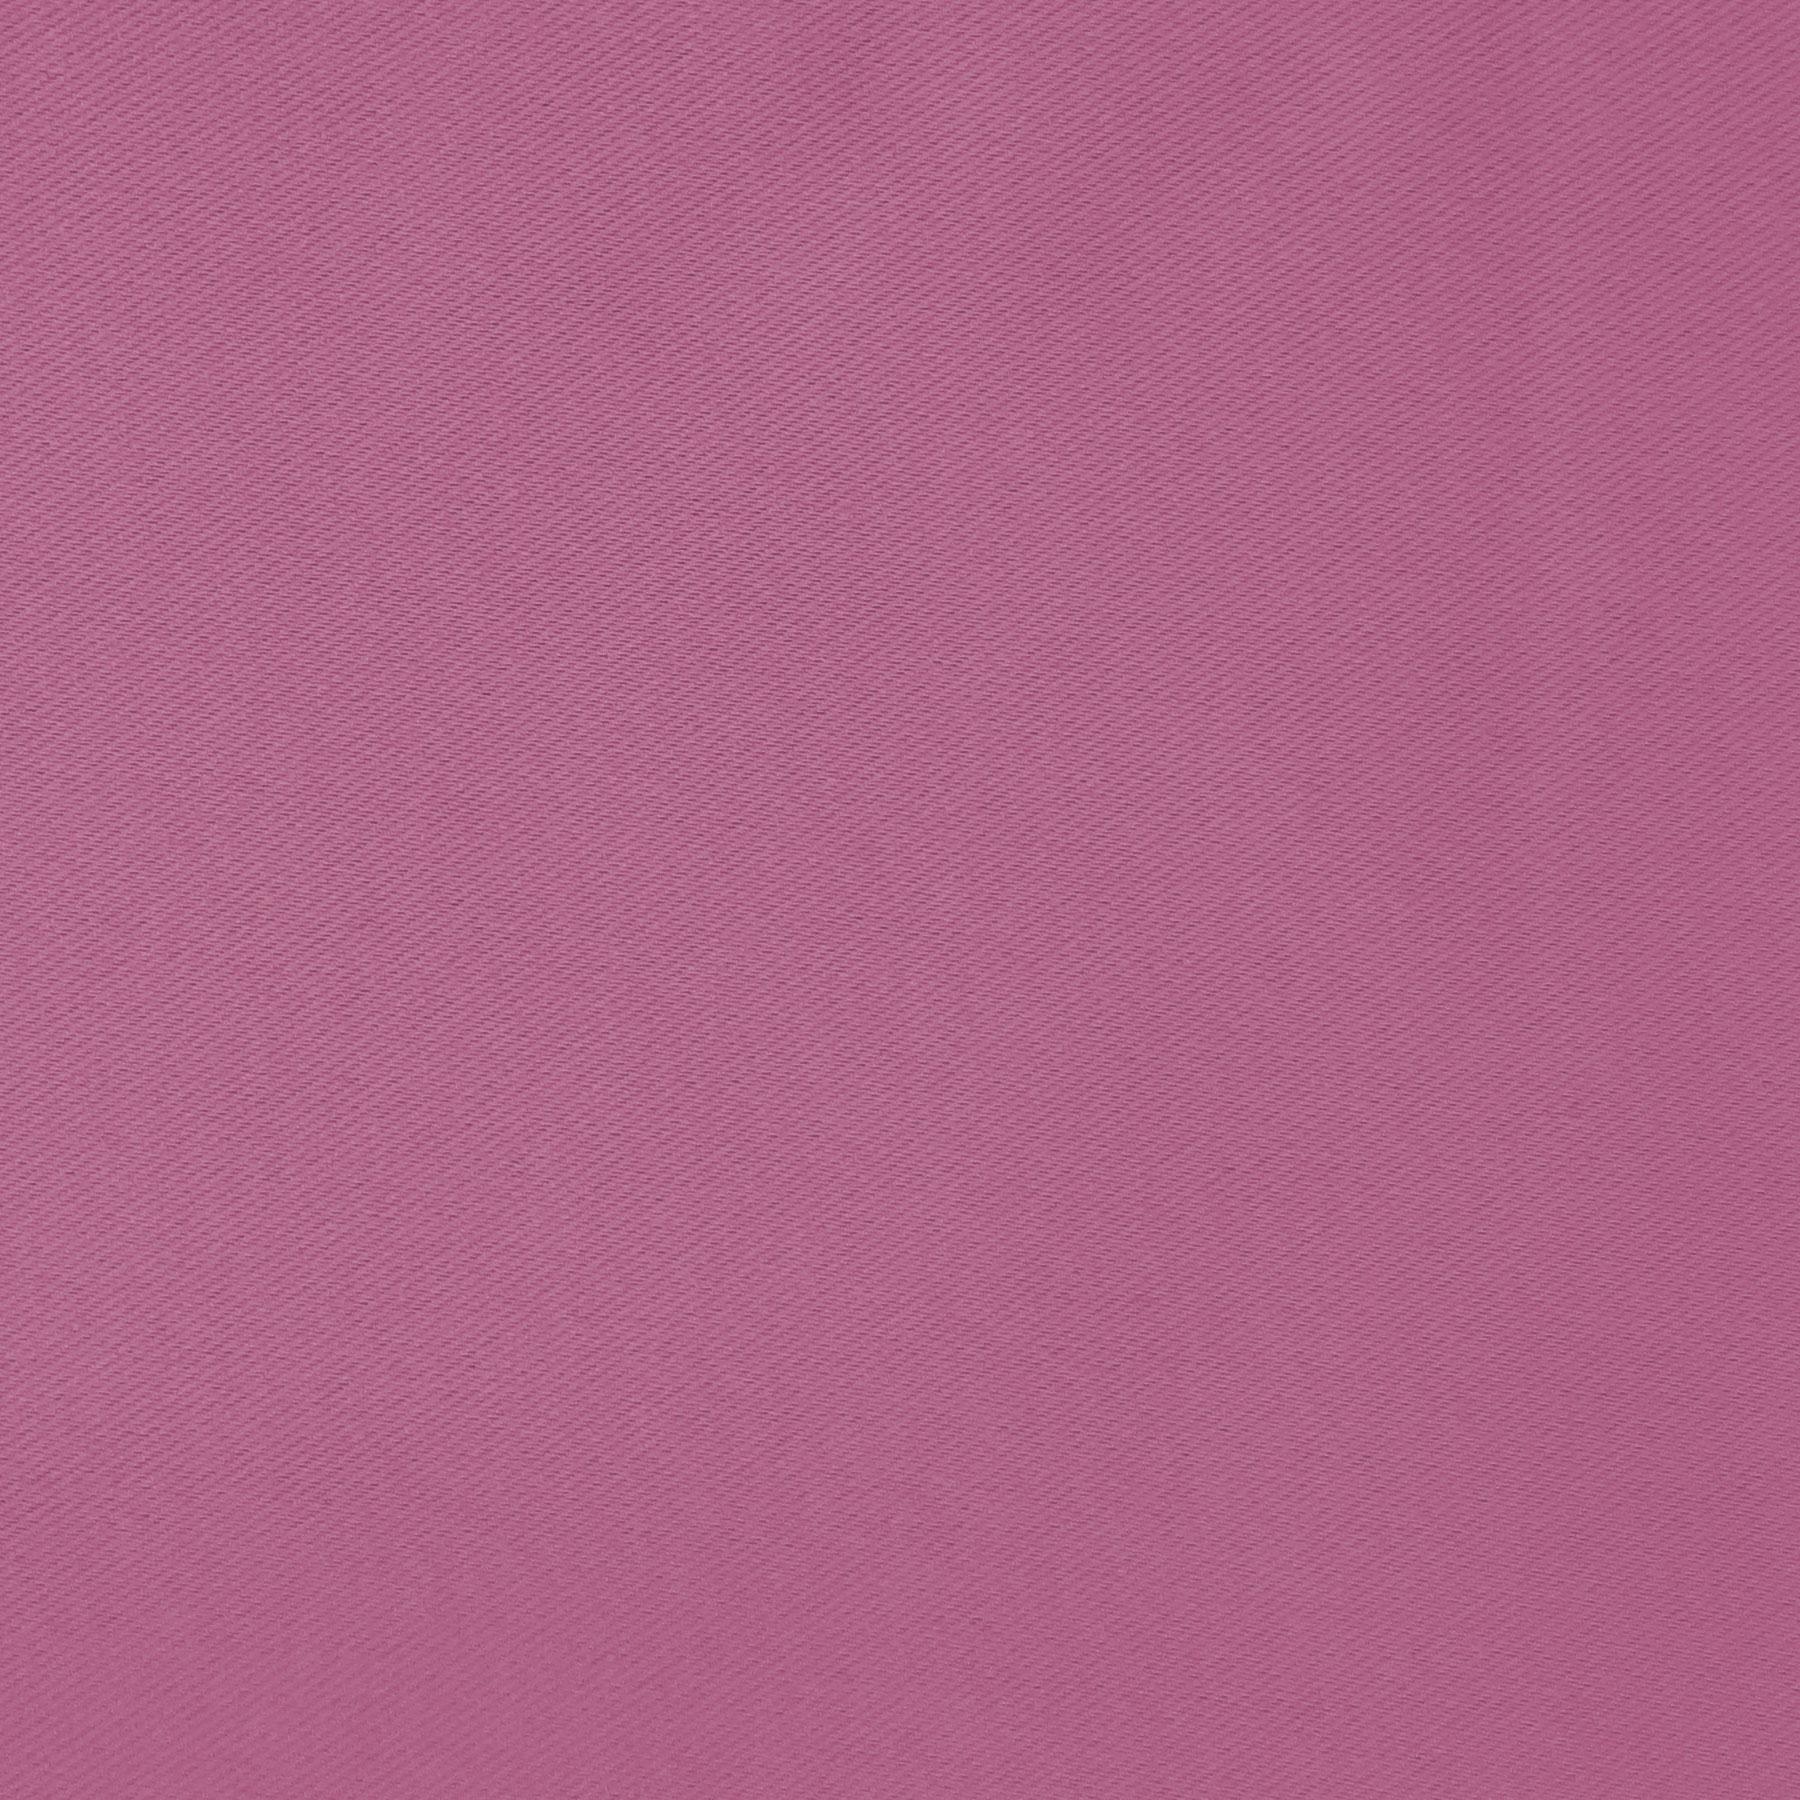 VerdunkelungsVorhang LONDON Soho Edition Lime Pink Lila Mint - Verdunkelungsvorhang schlafzimmer